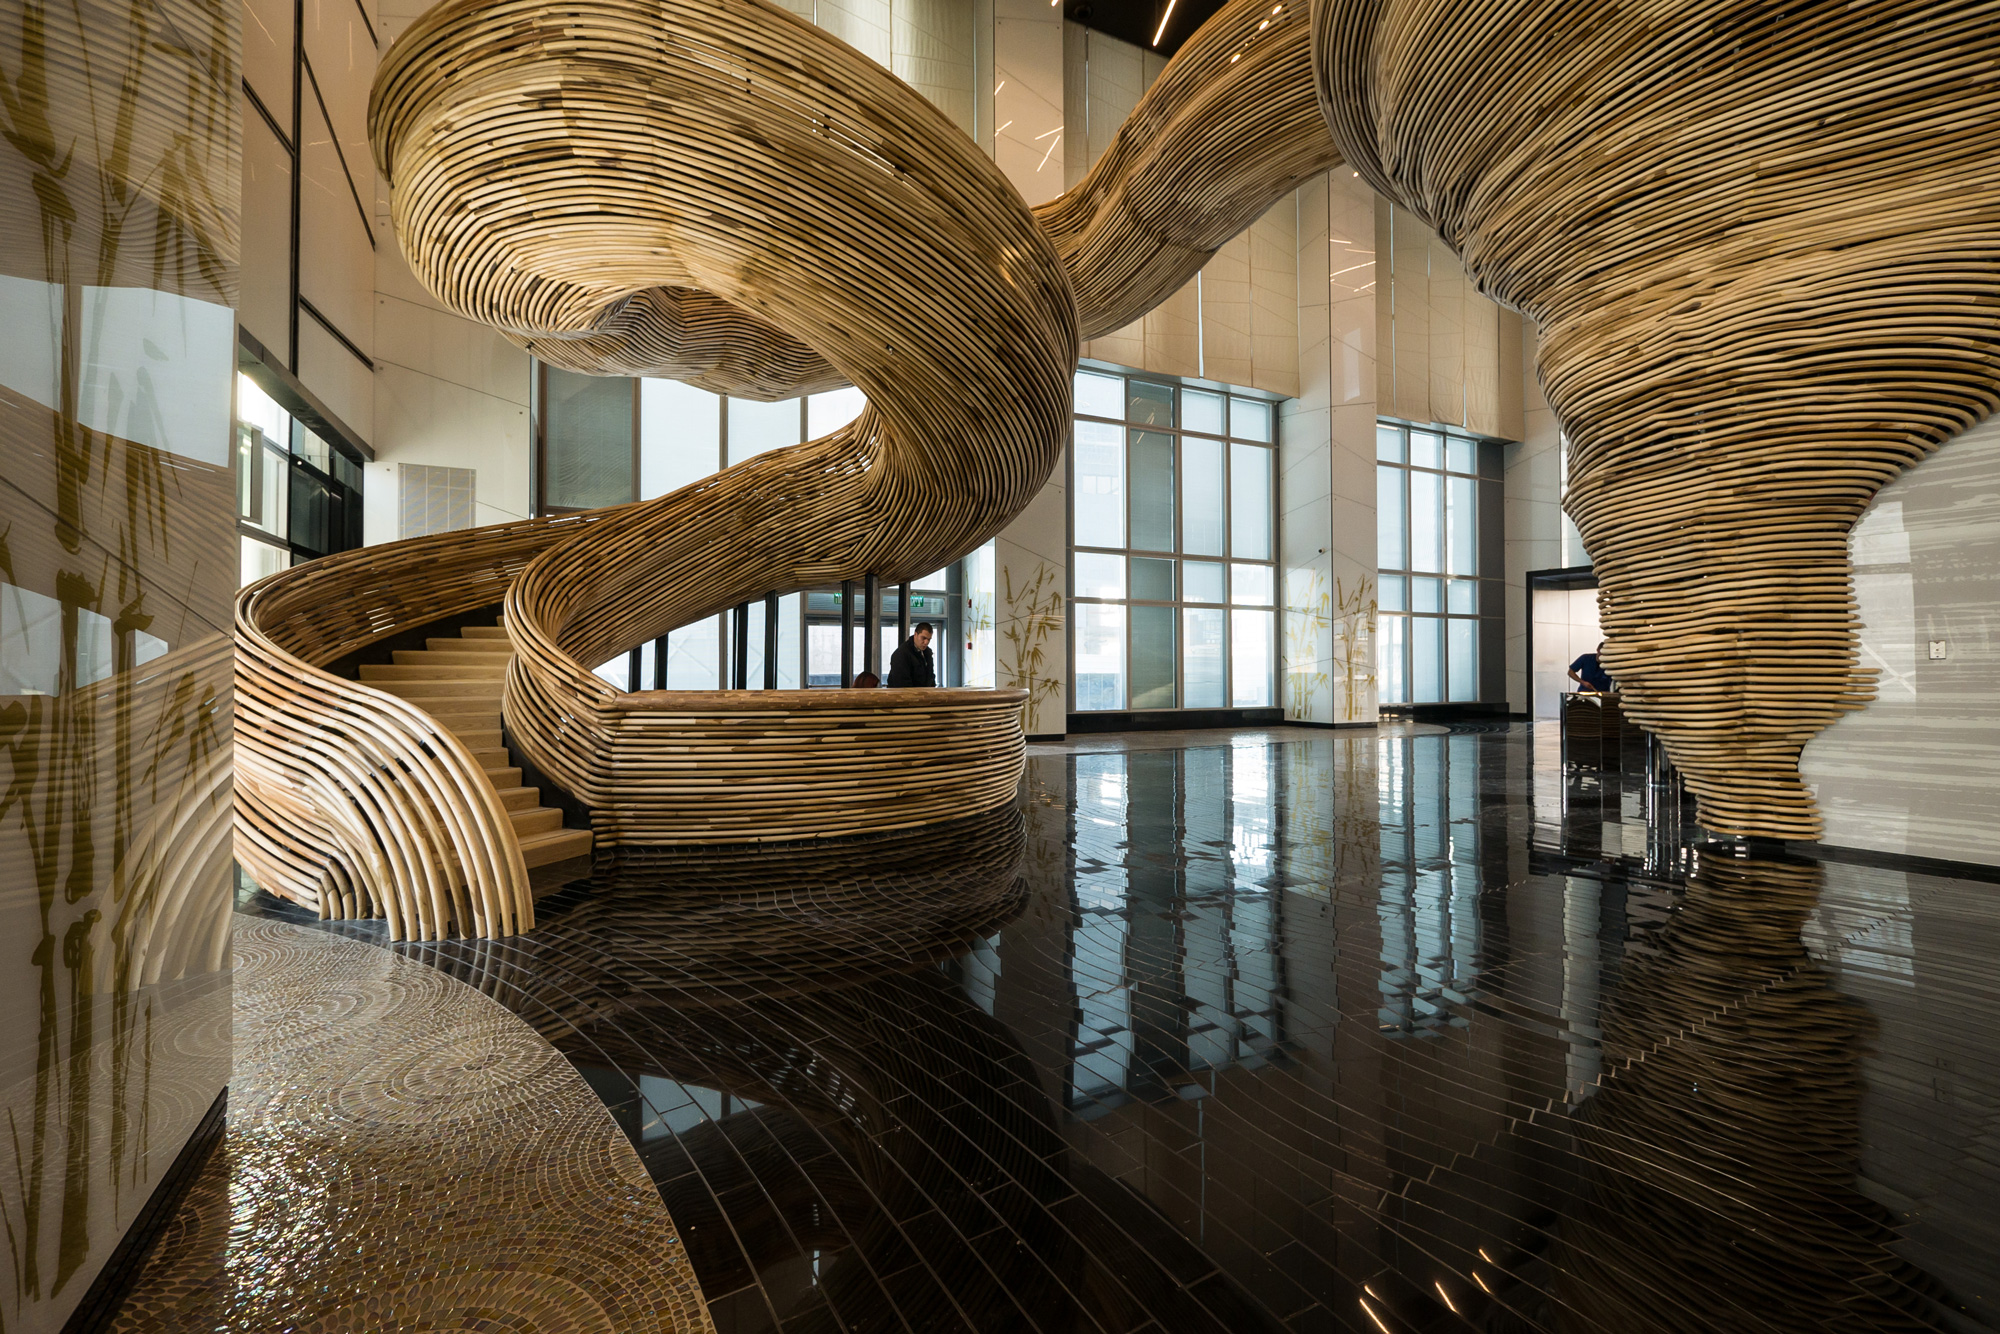 La scala organica, Oded Halaf © Itay Sikolski